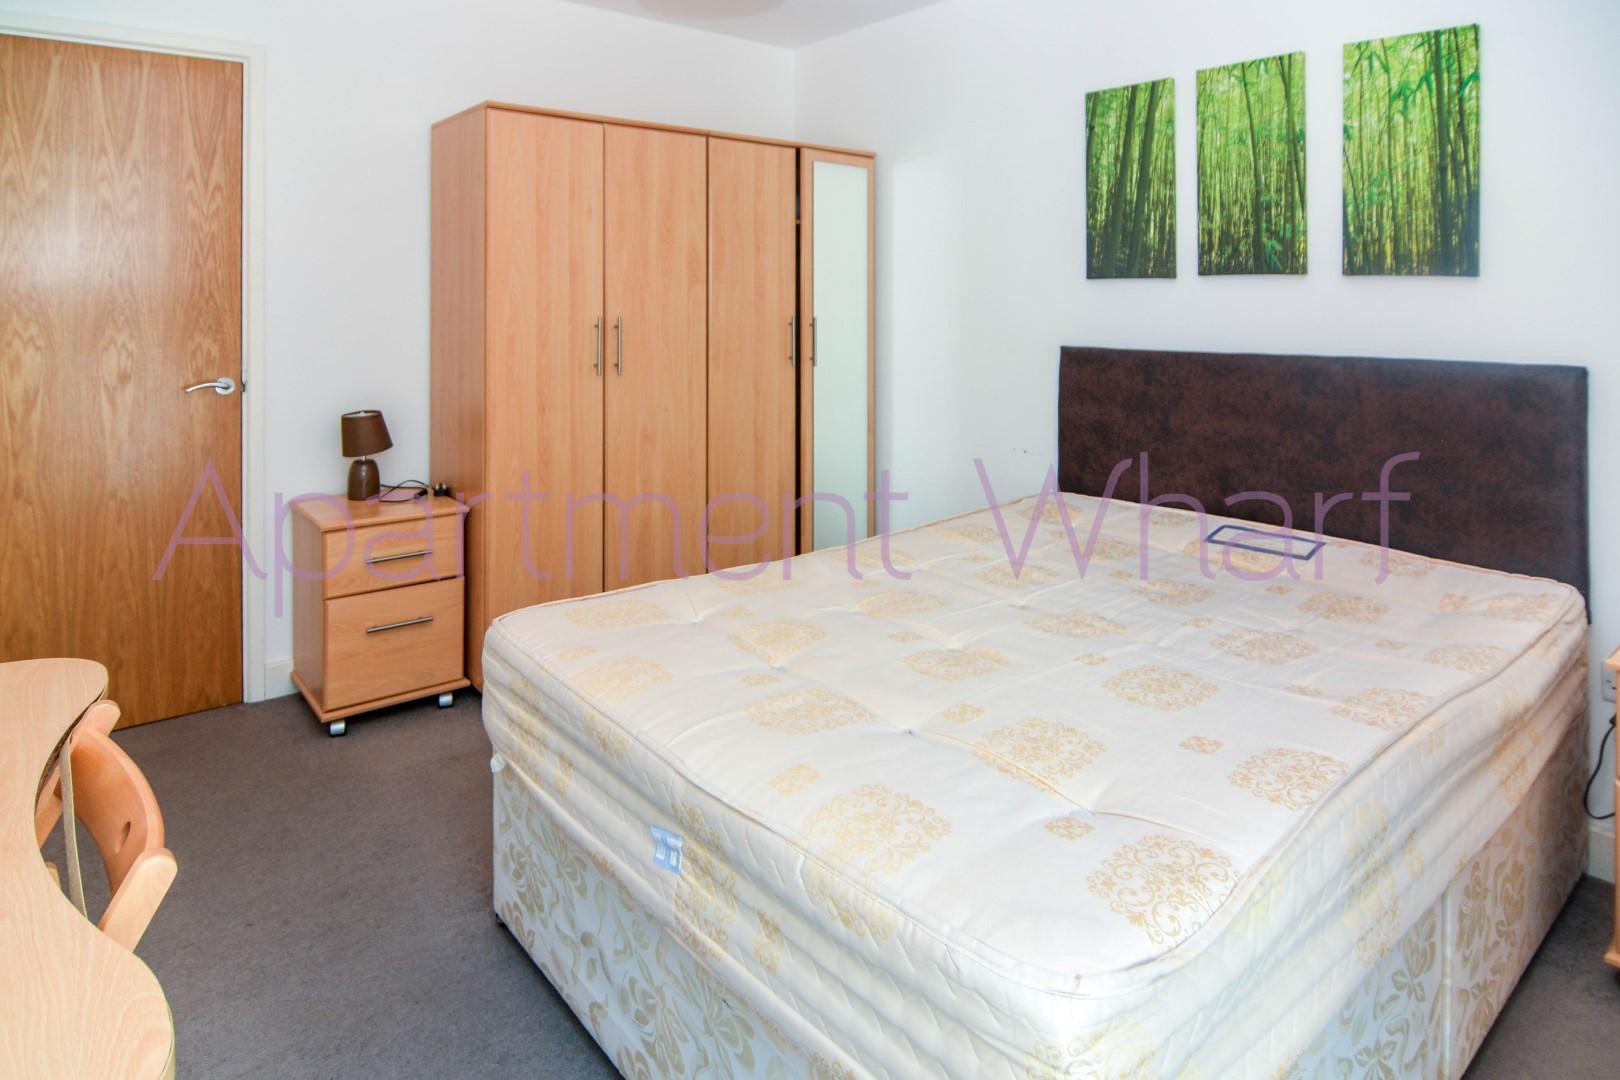 roomc(2)(Large)jpg